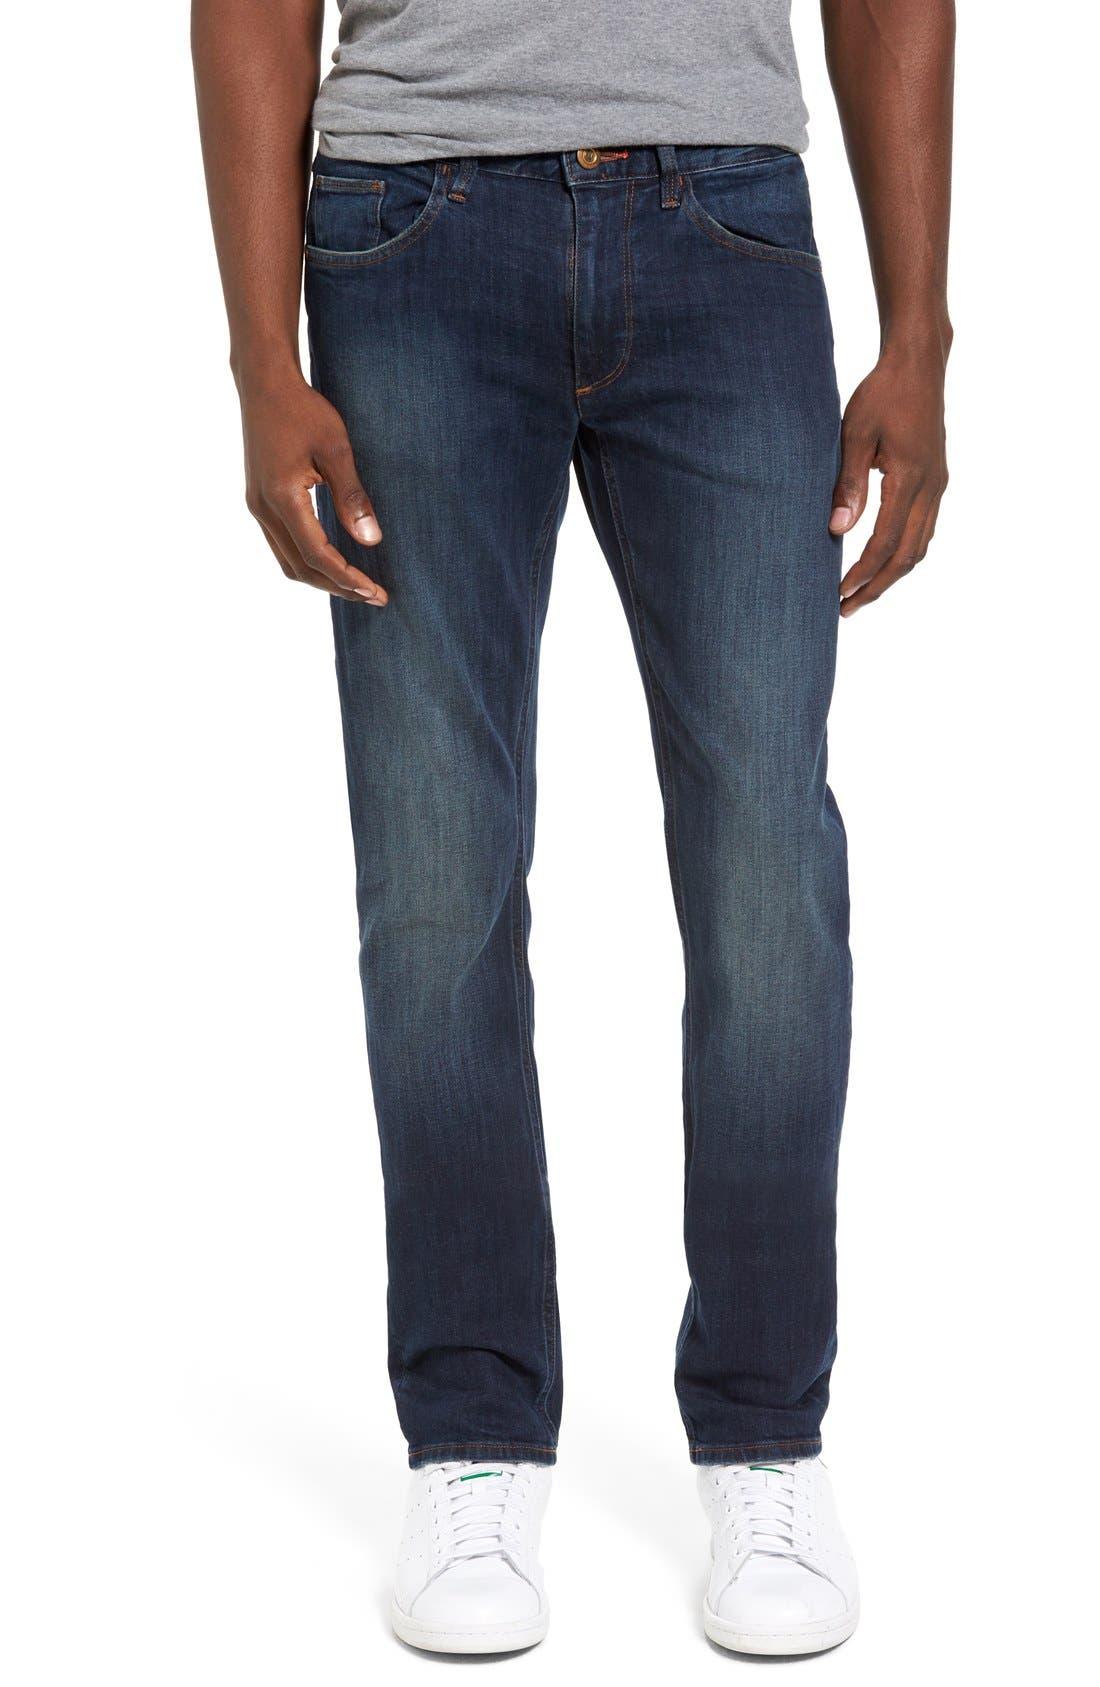 Spitfire Slim Fit Jeans,                             Main thumbnail 1, color,                             INDIGO